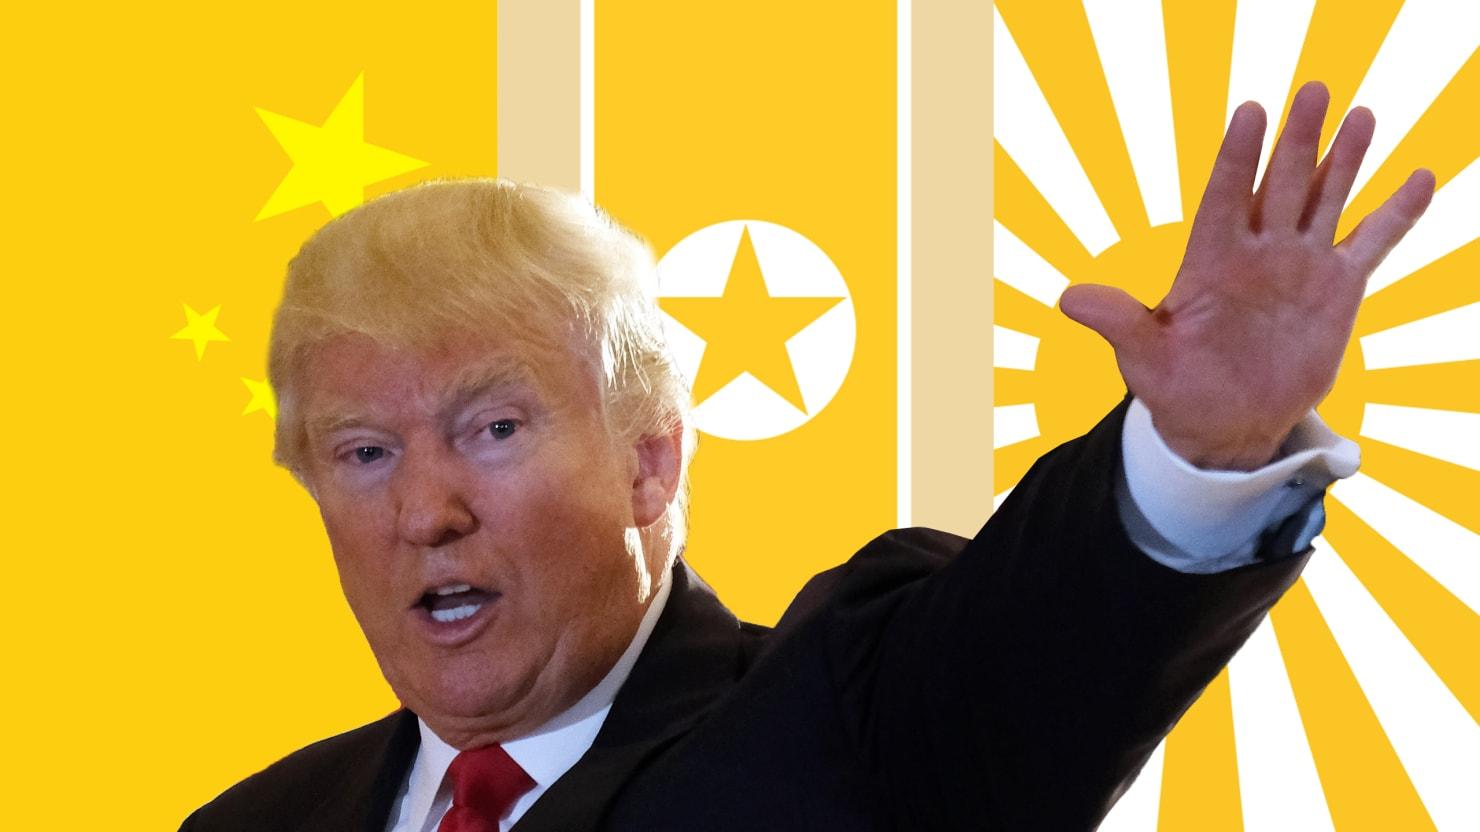 As President, Trump's 'Asia Pivot' Will Be Toward War